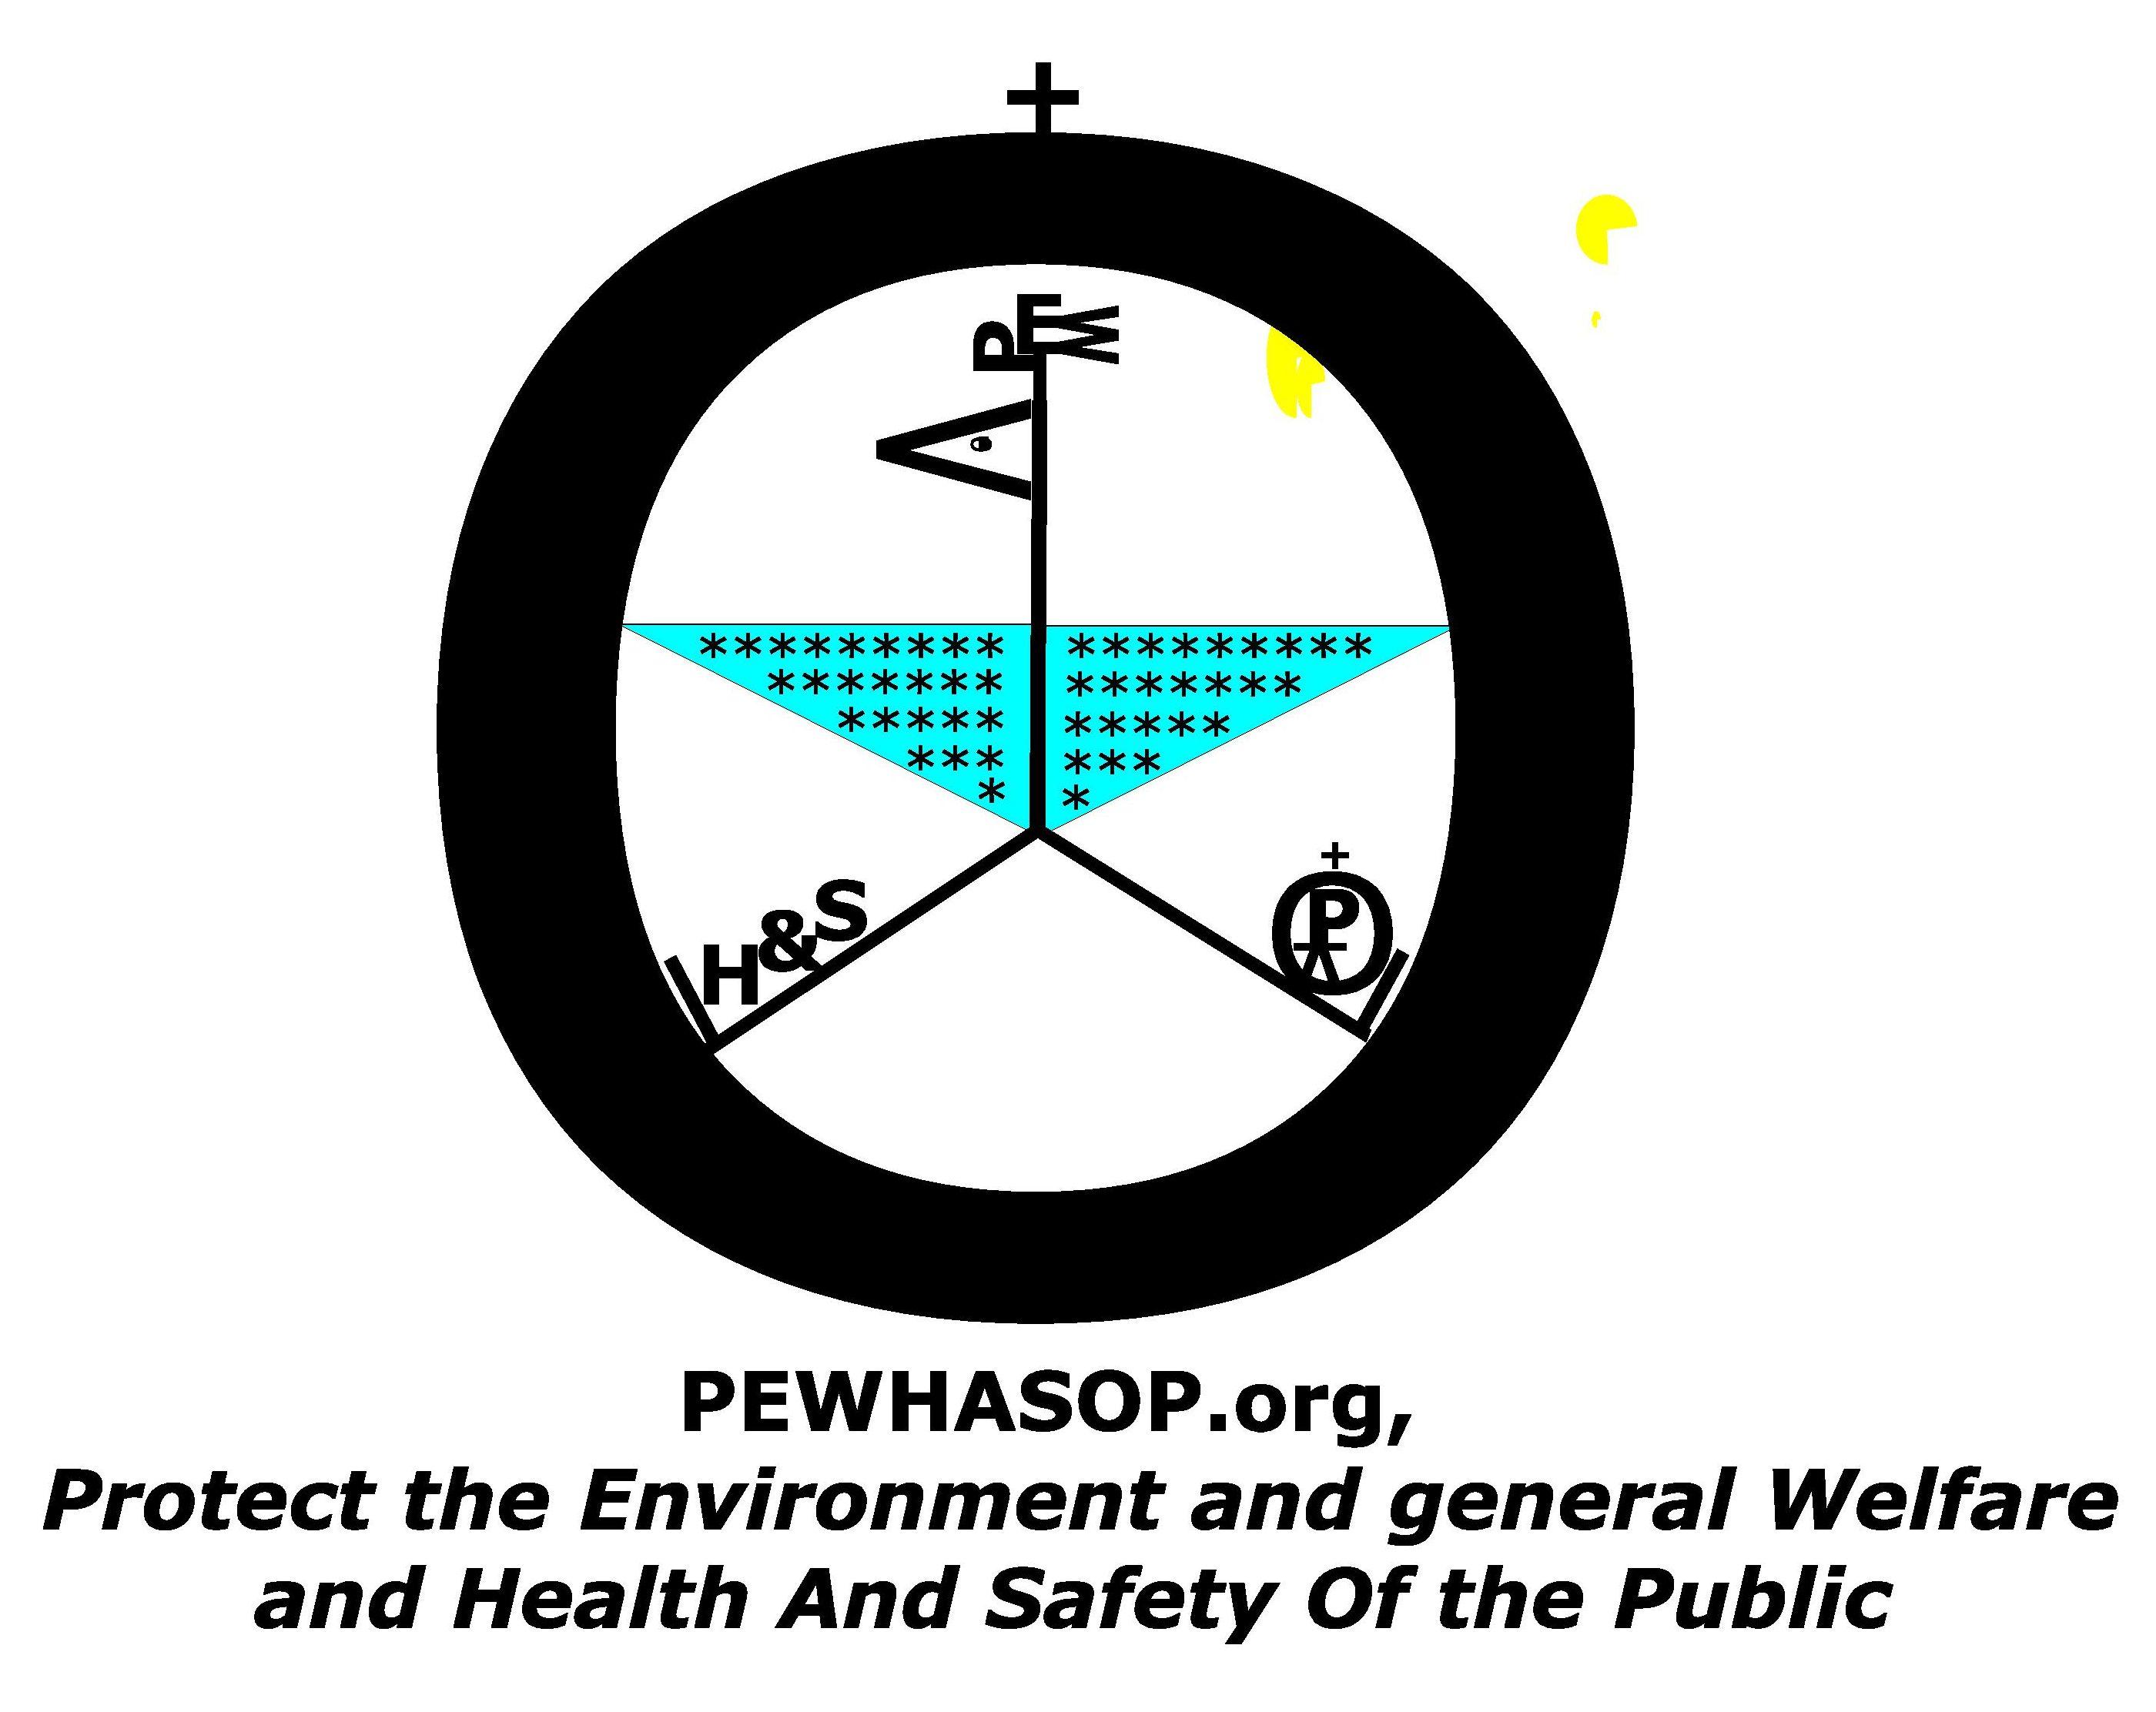 PEWHASOP.org